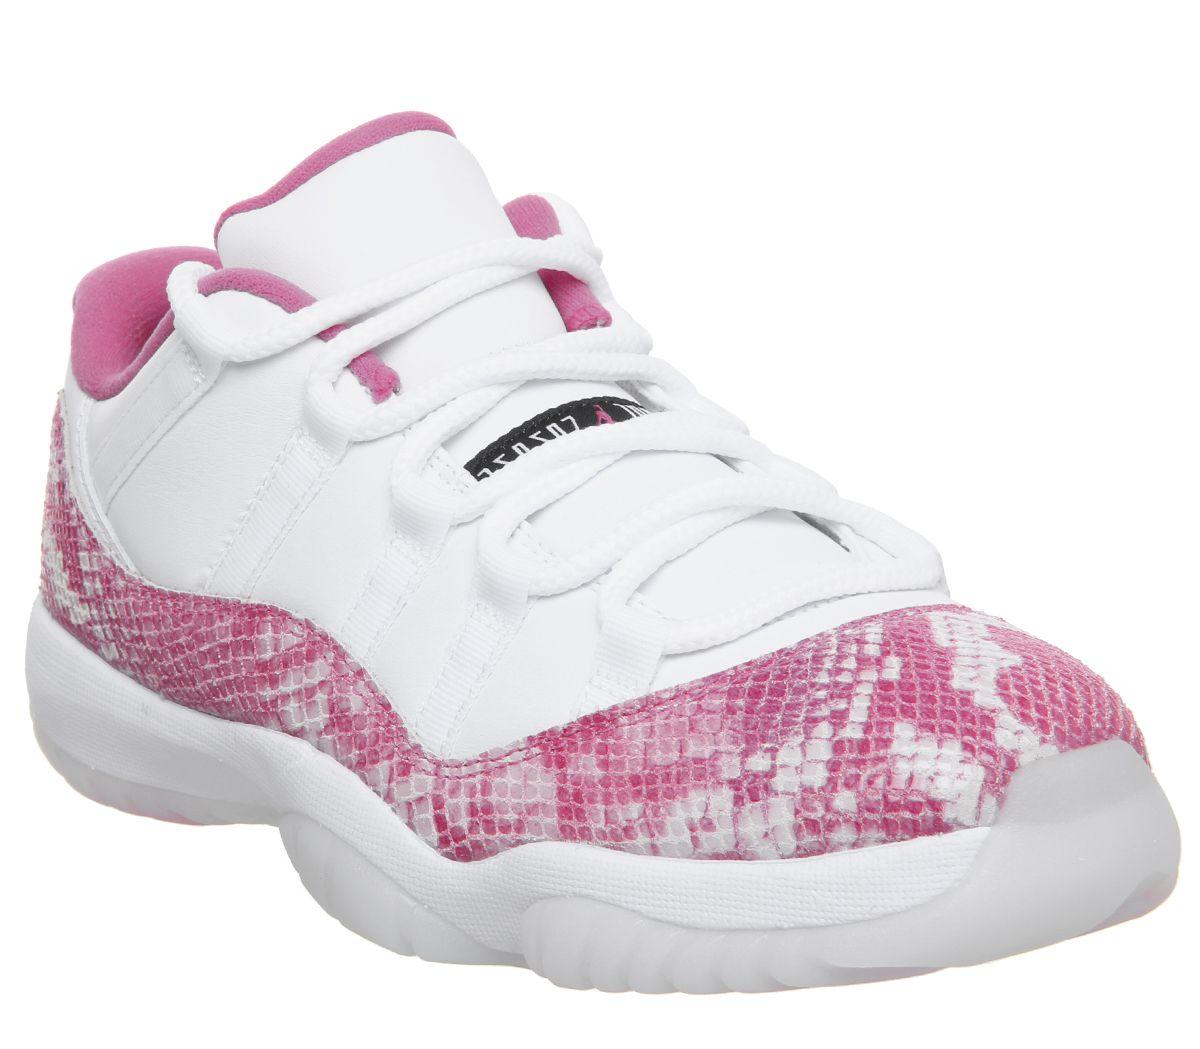 the best attitude 976eb b5892 Jordan Air Jordan 11 Low Trainers White Black Rust Pink ...